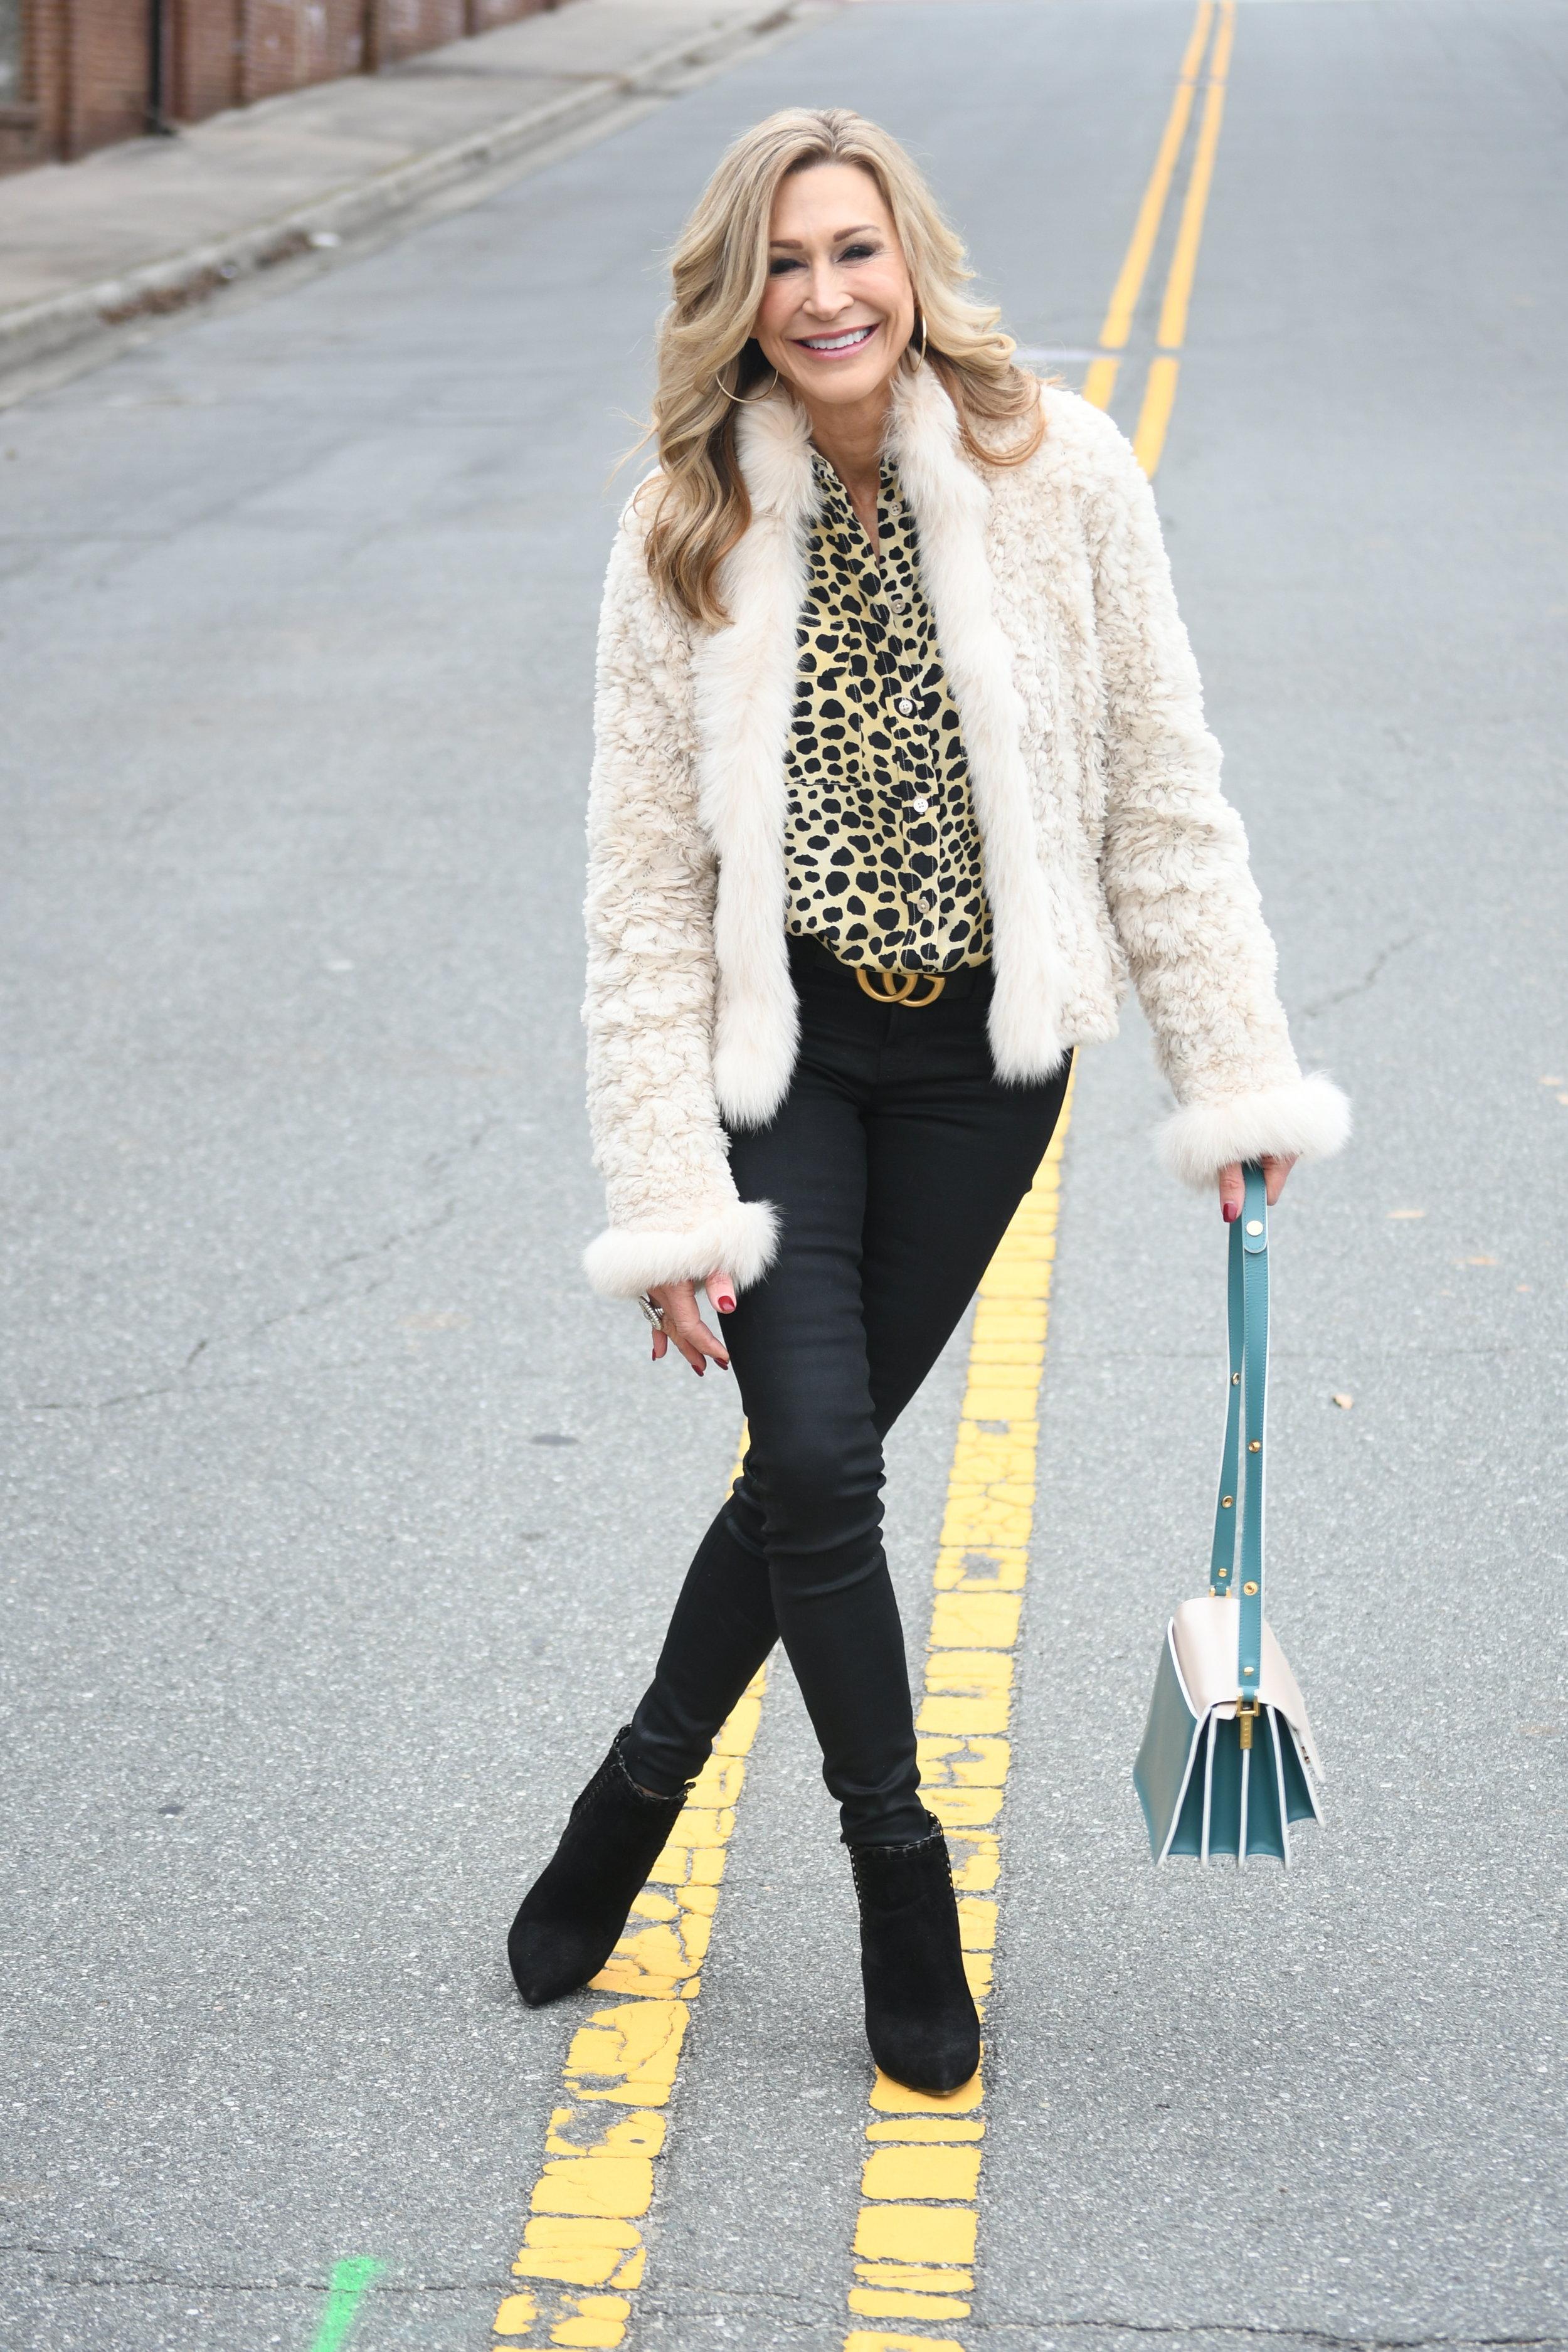 Fur Jacket with Leopard Print Blouse - Crazy Blonde Life